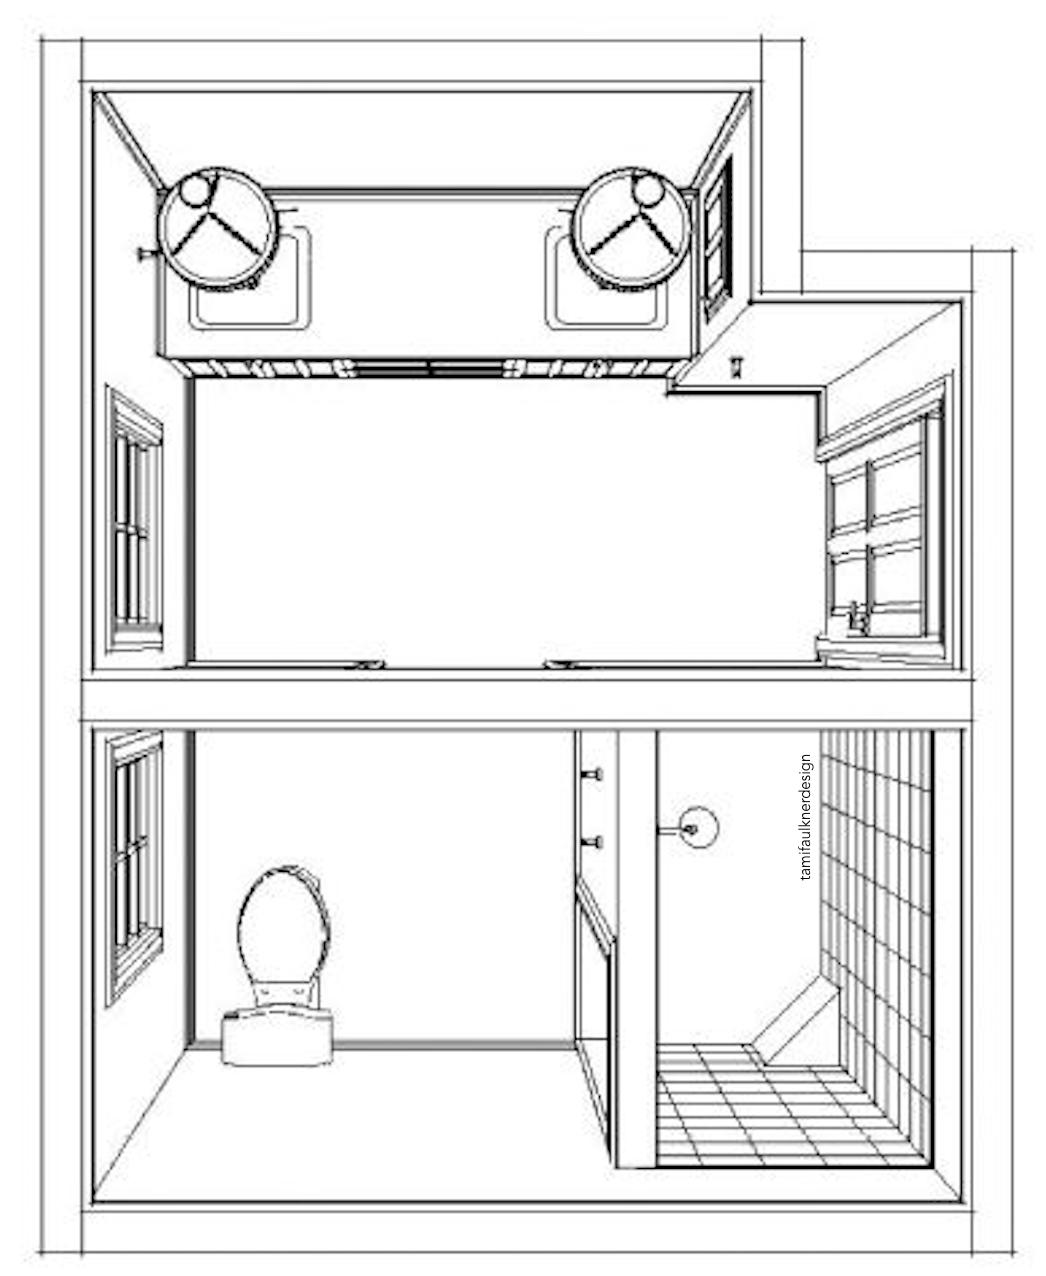 perspective plan - OPTION D